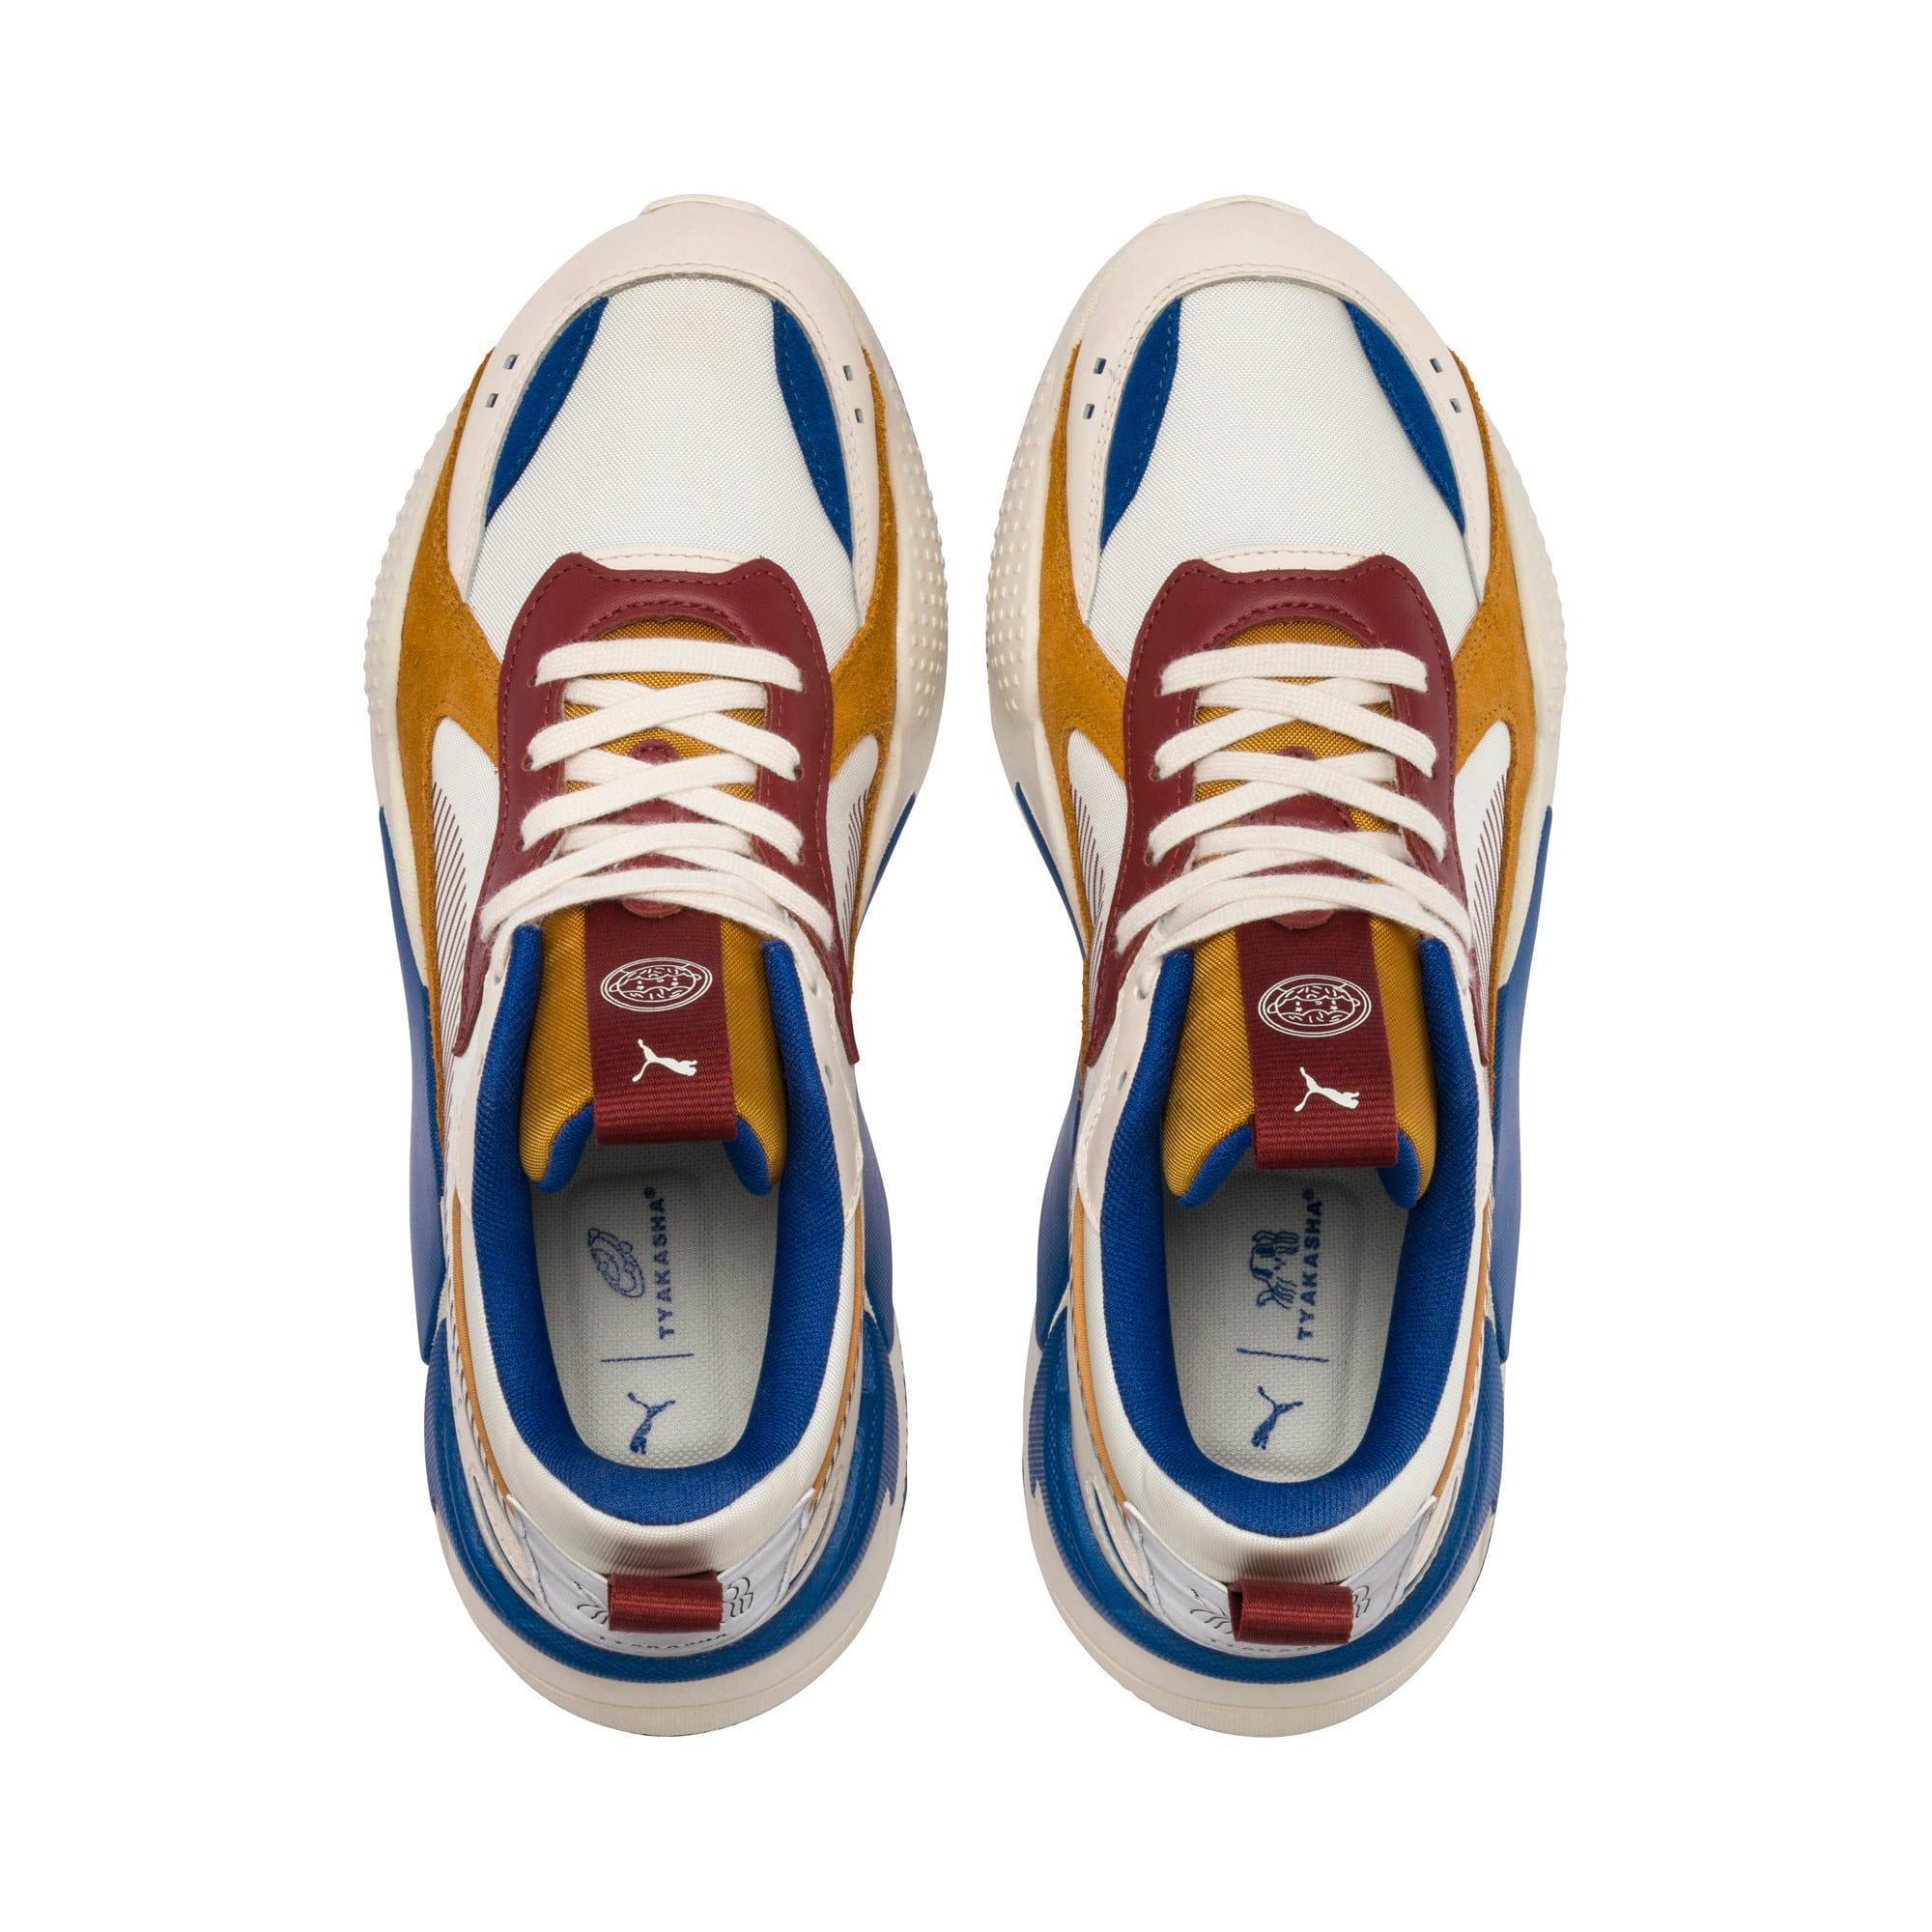 Thumbnail 8 of PUMA x TYAKASHA RS-X Sneakers, Whisper White-Fired Brick, medium